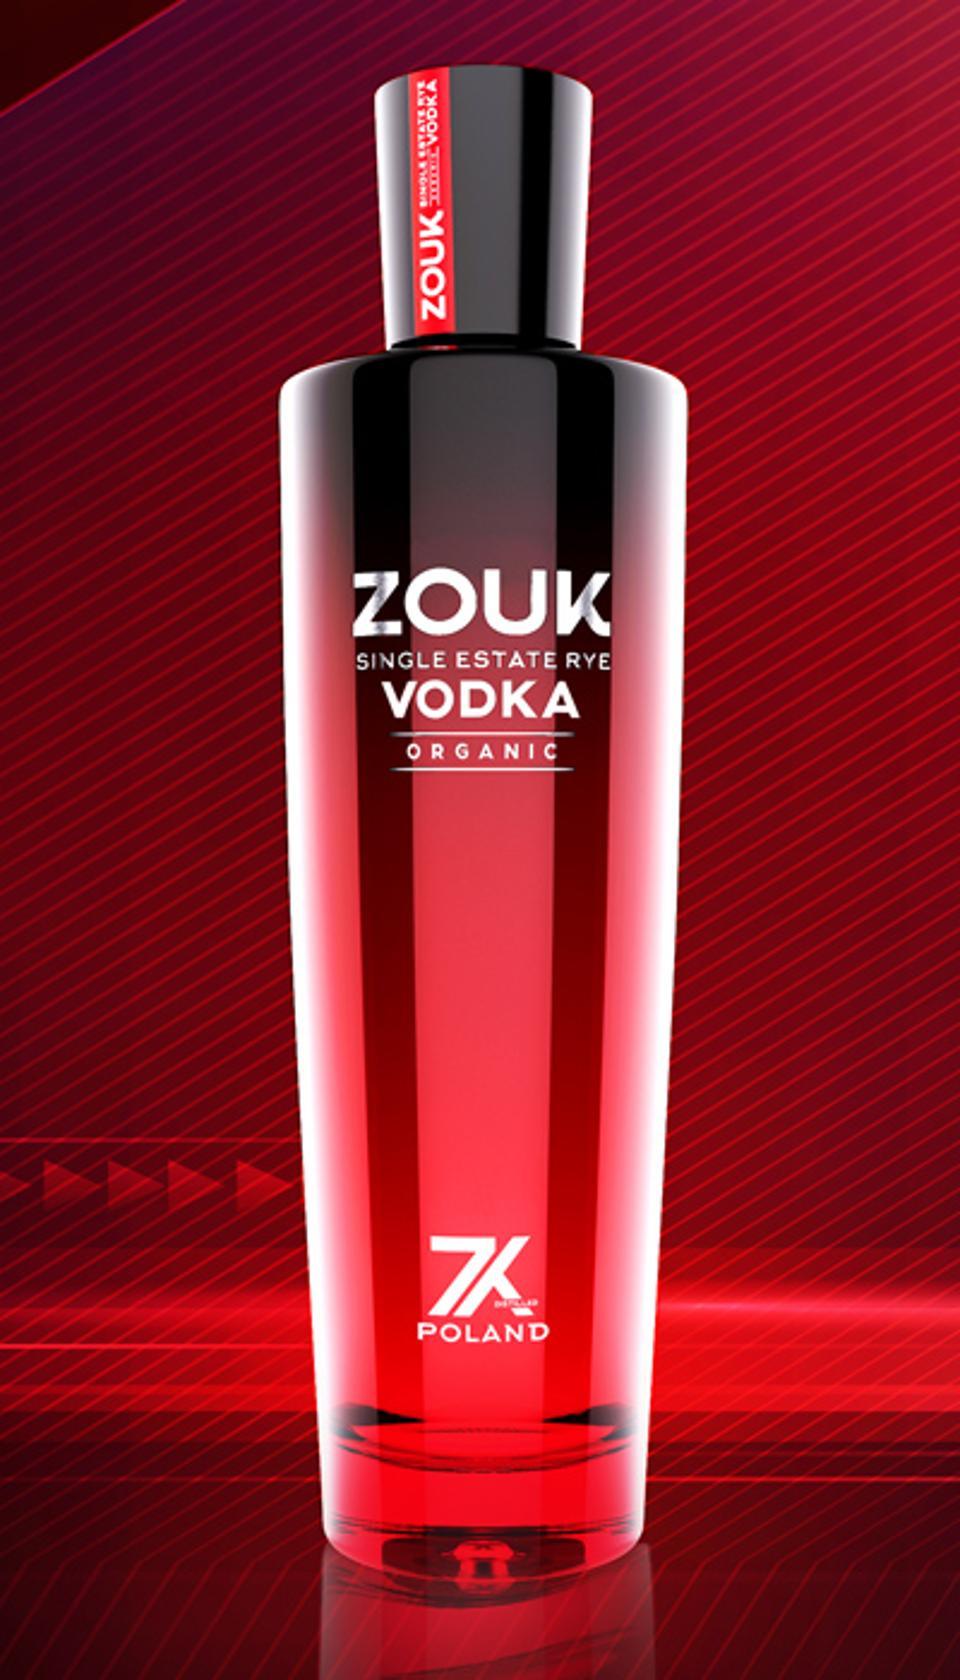 Zouk, Single Estate Rye Vodka